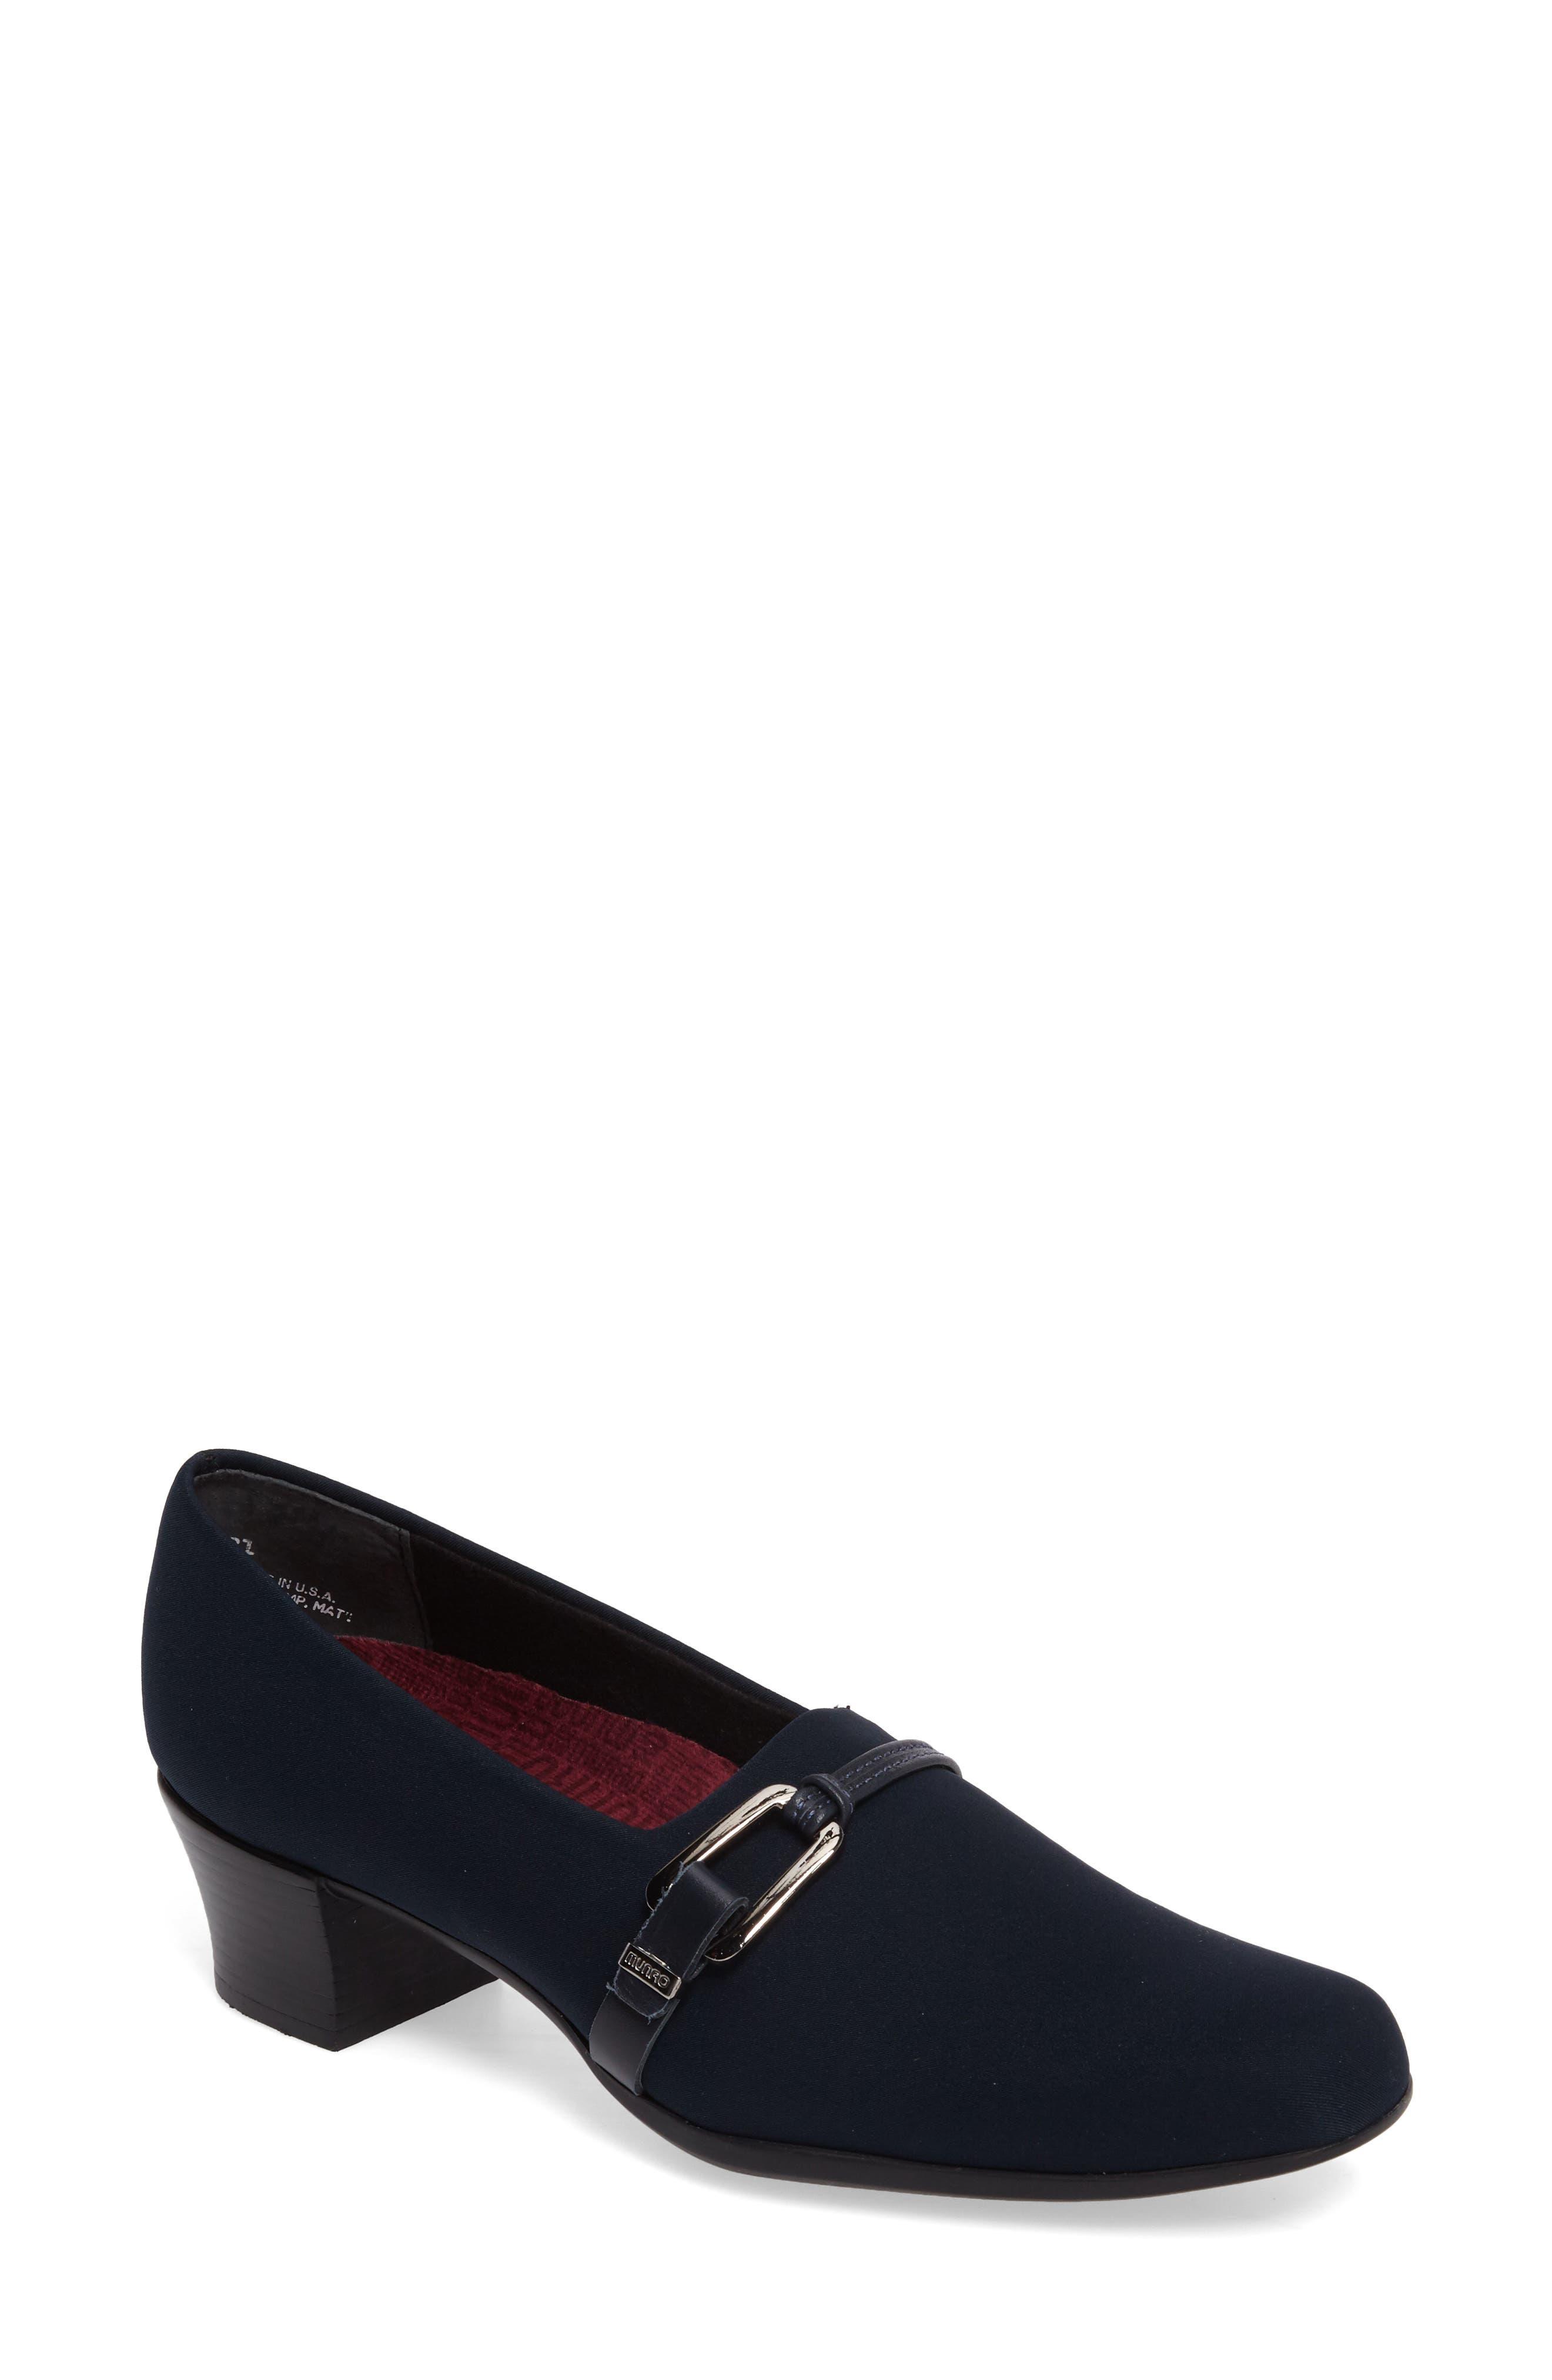 f6bac8e7d573 Munro Women s Shoes